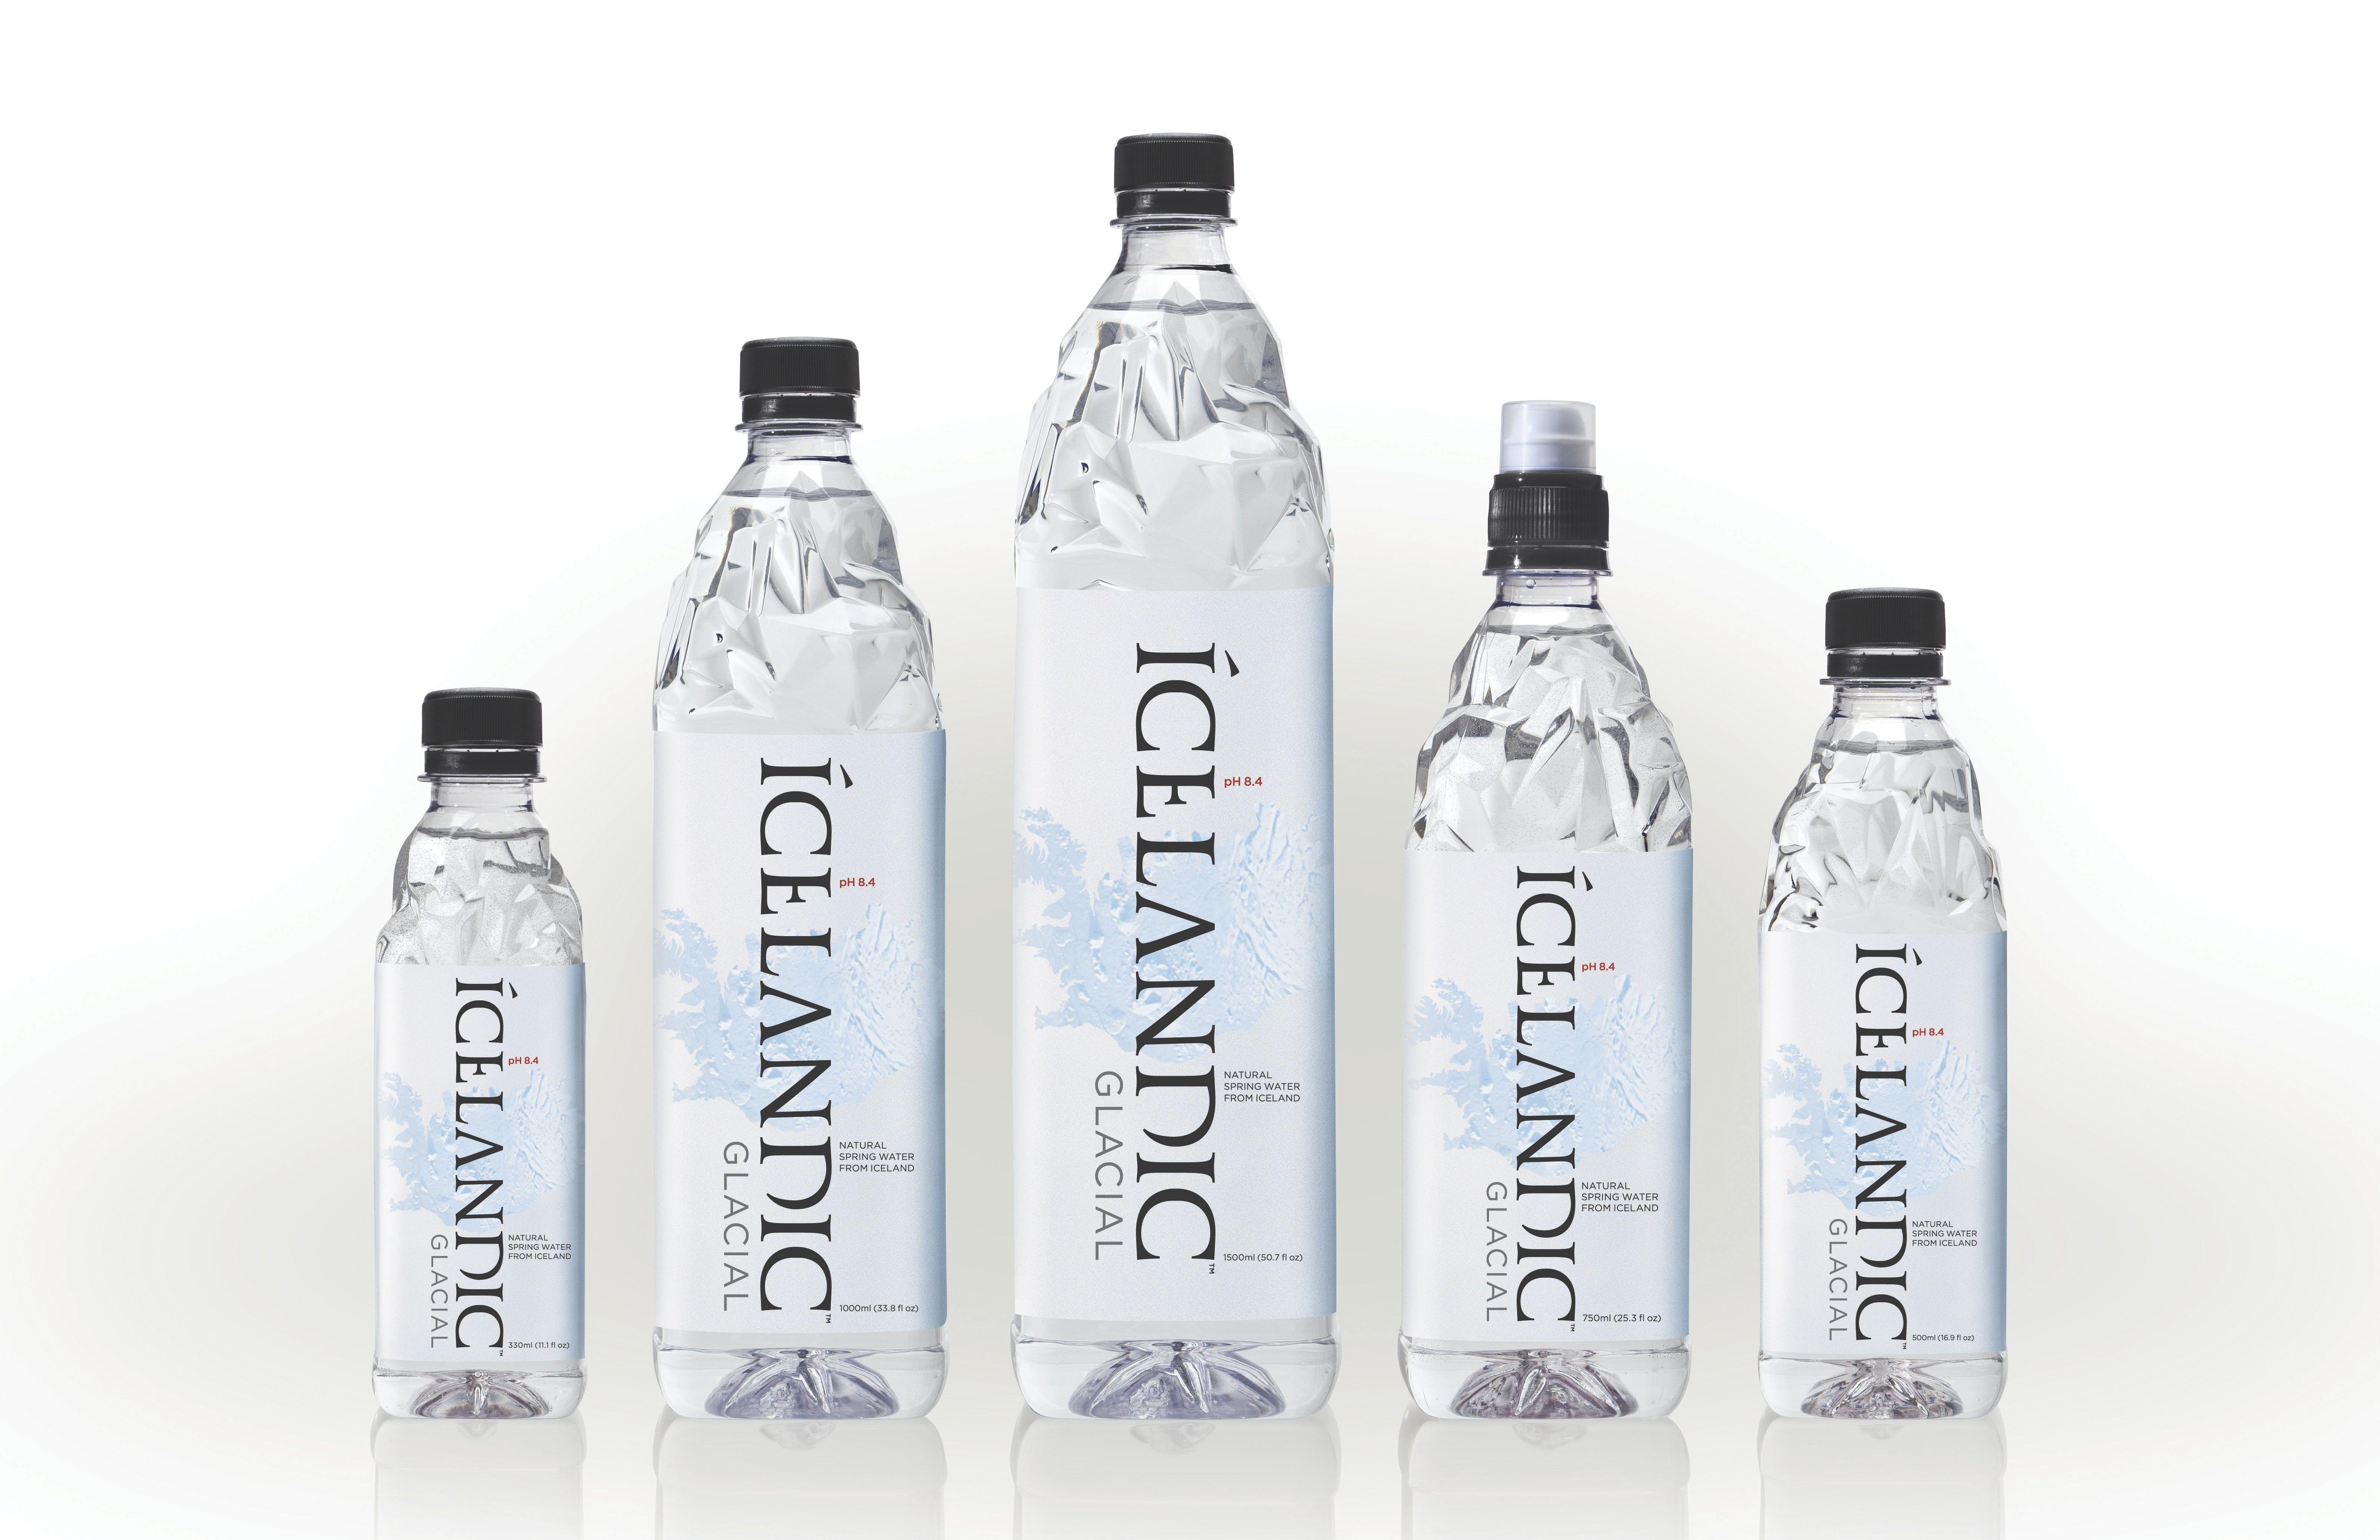 Icelandic Glacial Water Family Photo | Icelandic Glacial Natural ...